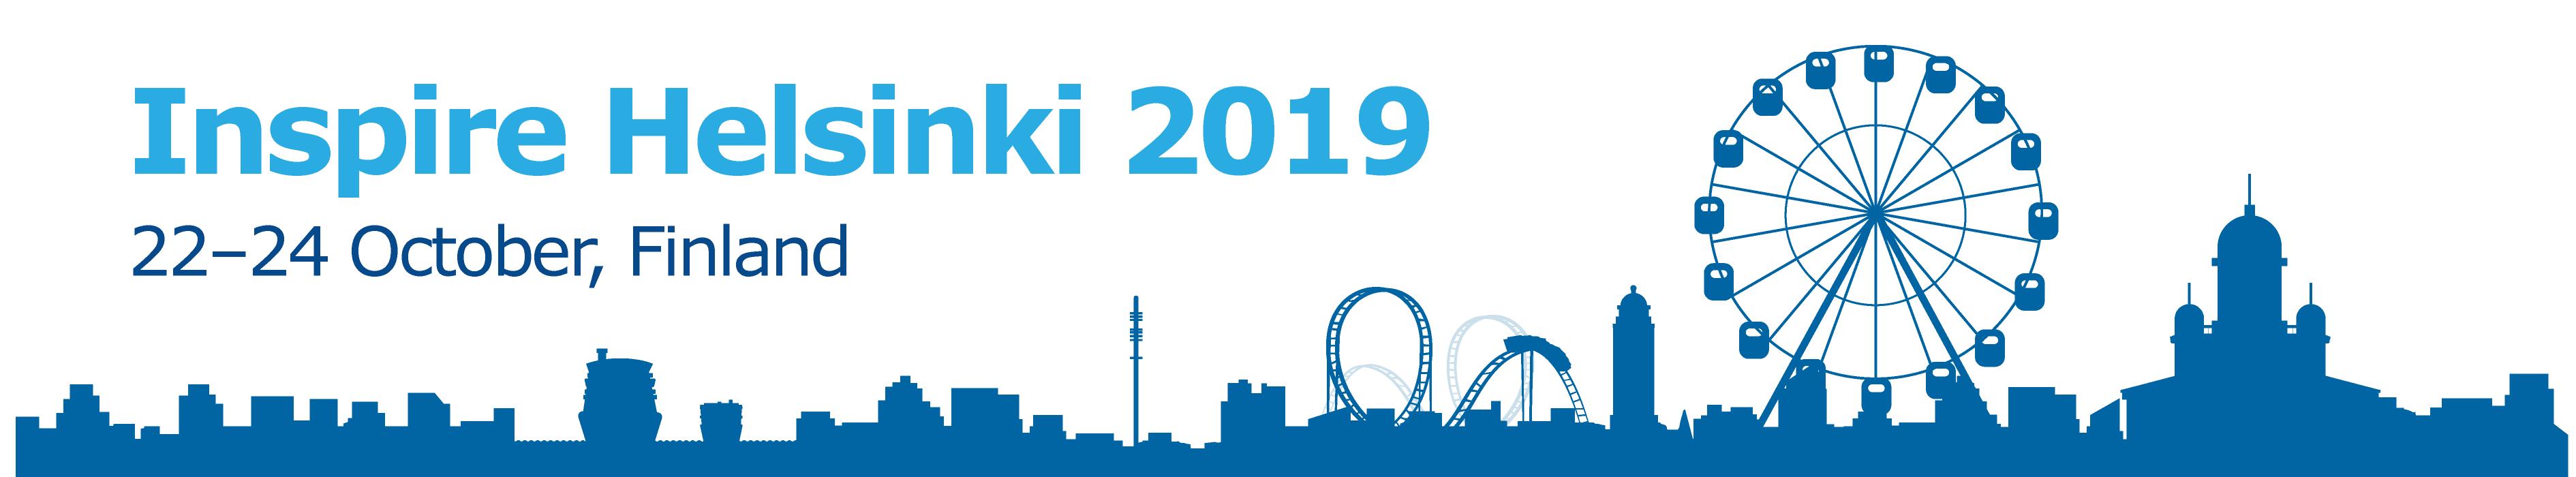 INSPIRE Helsinki 2019